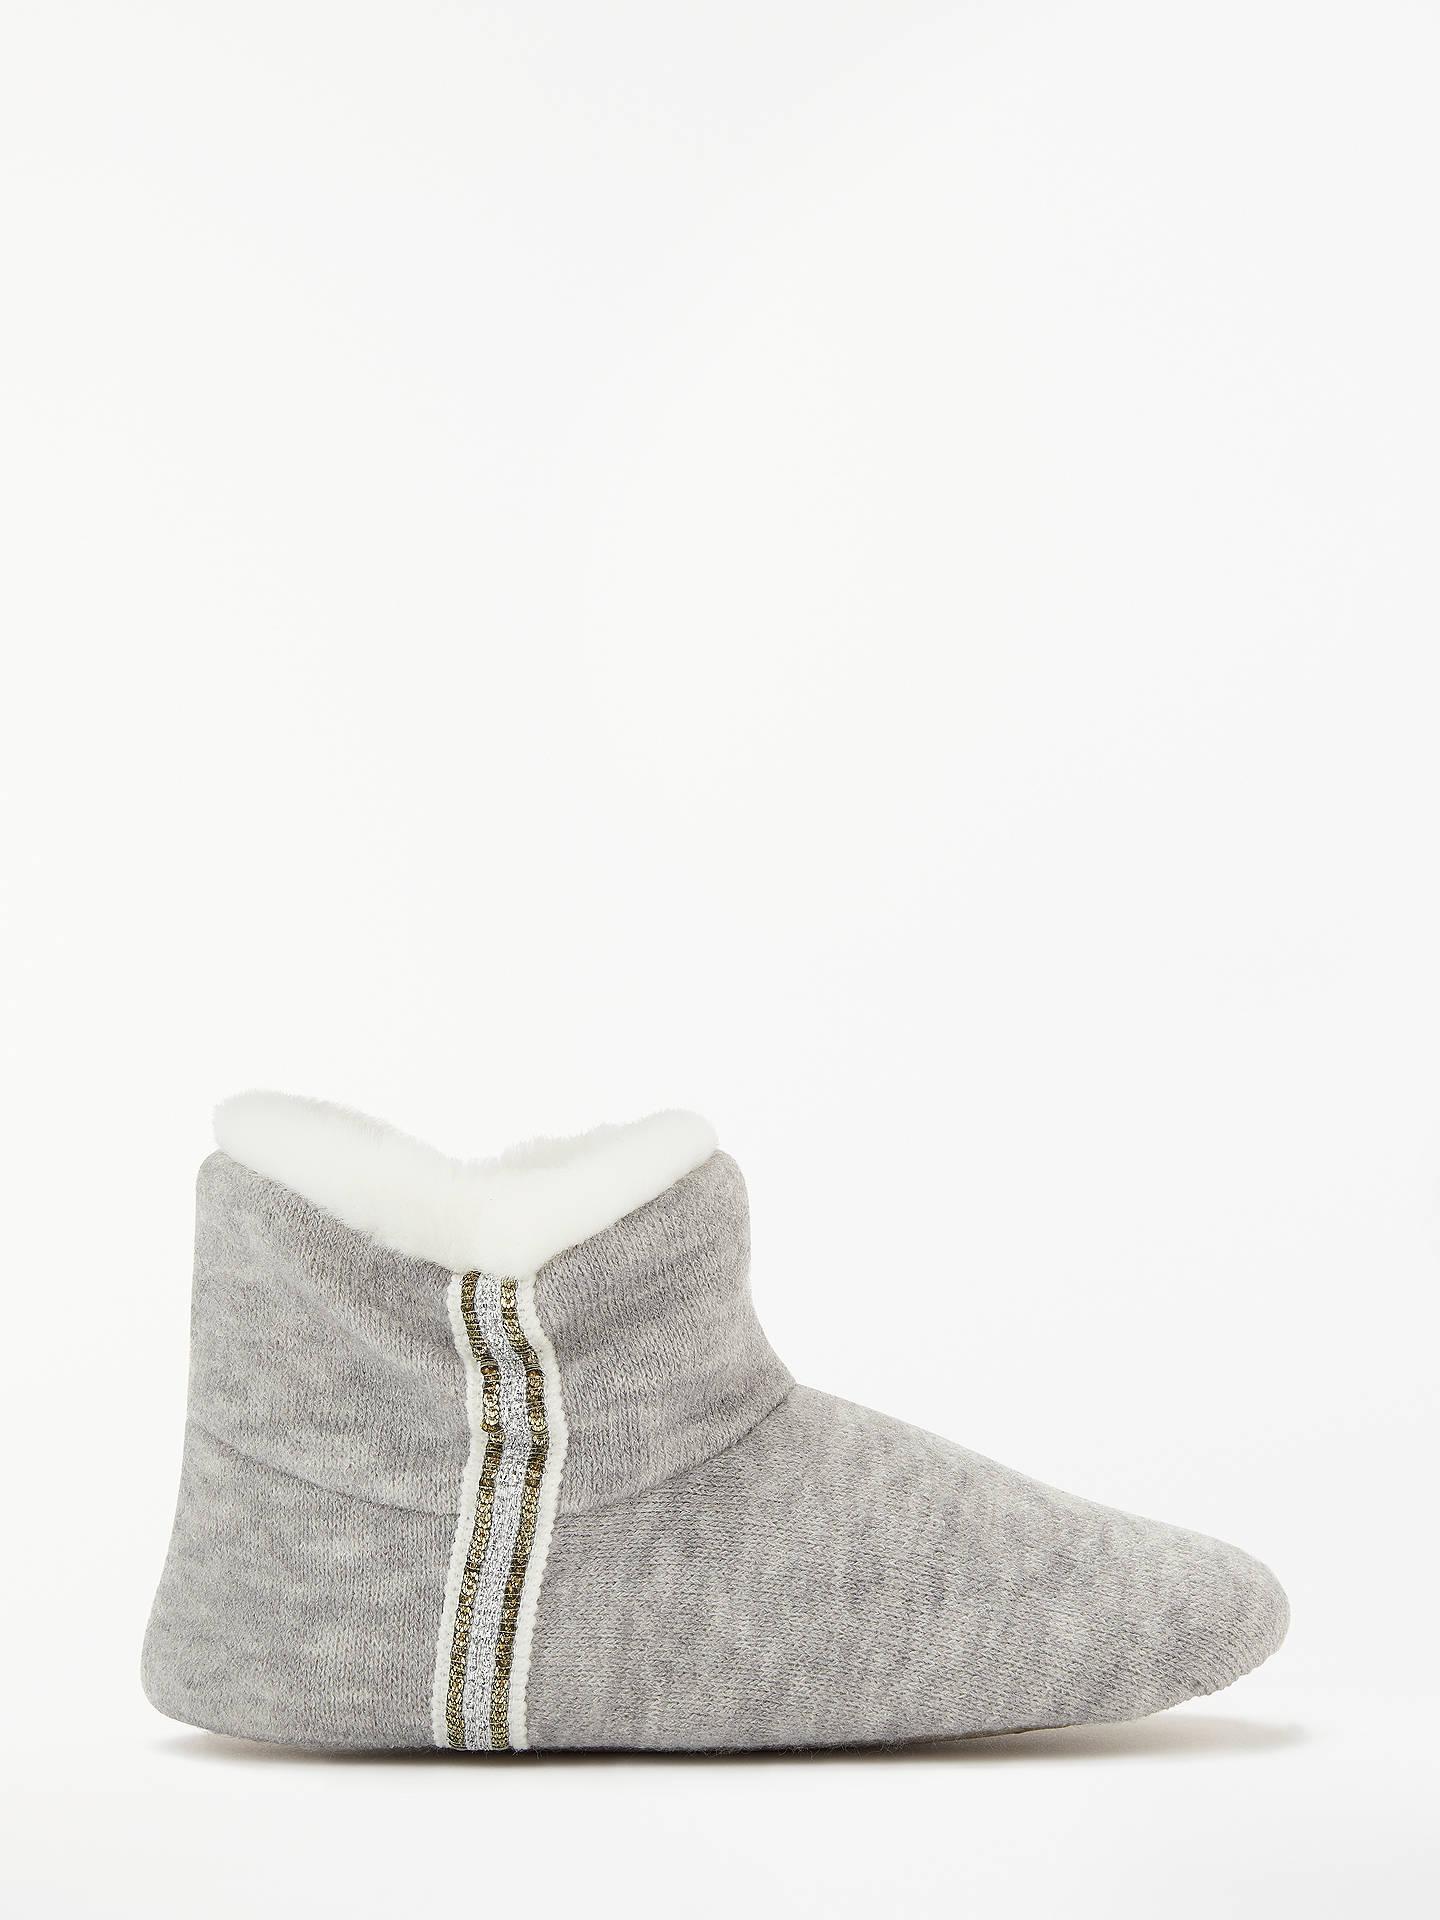 2021d83d46b John Lewis & Partners Fine Knit Sequin Boot Slippers, Grey at John ...